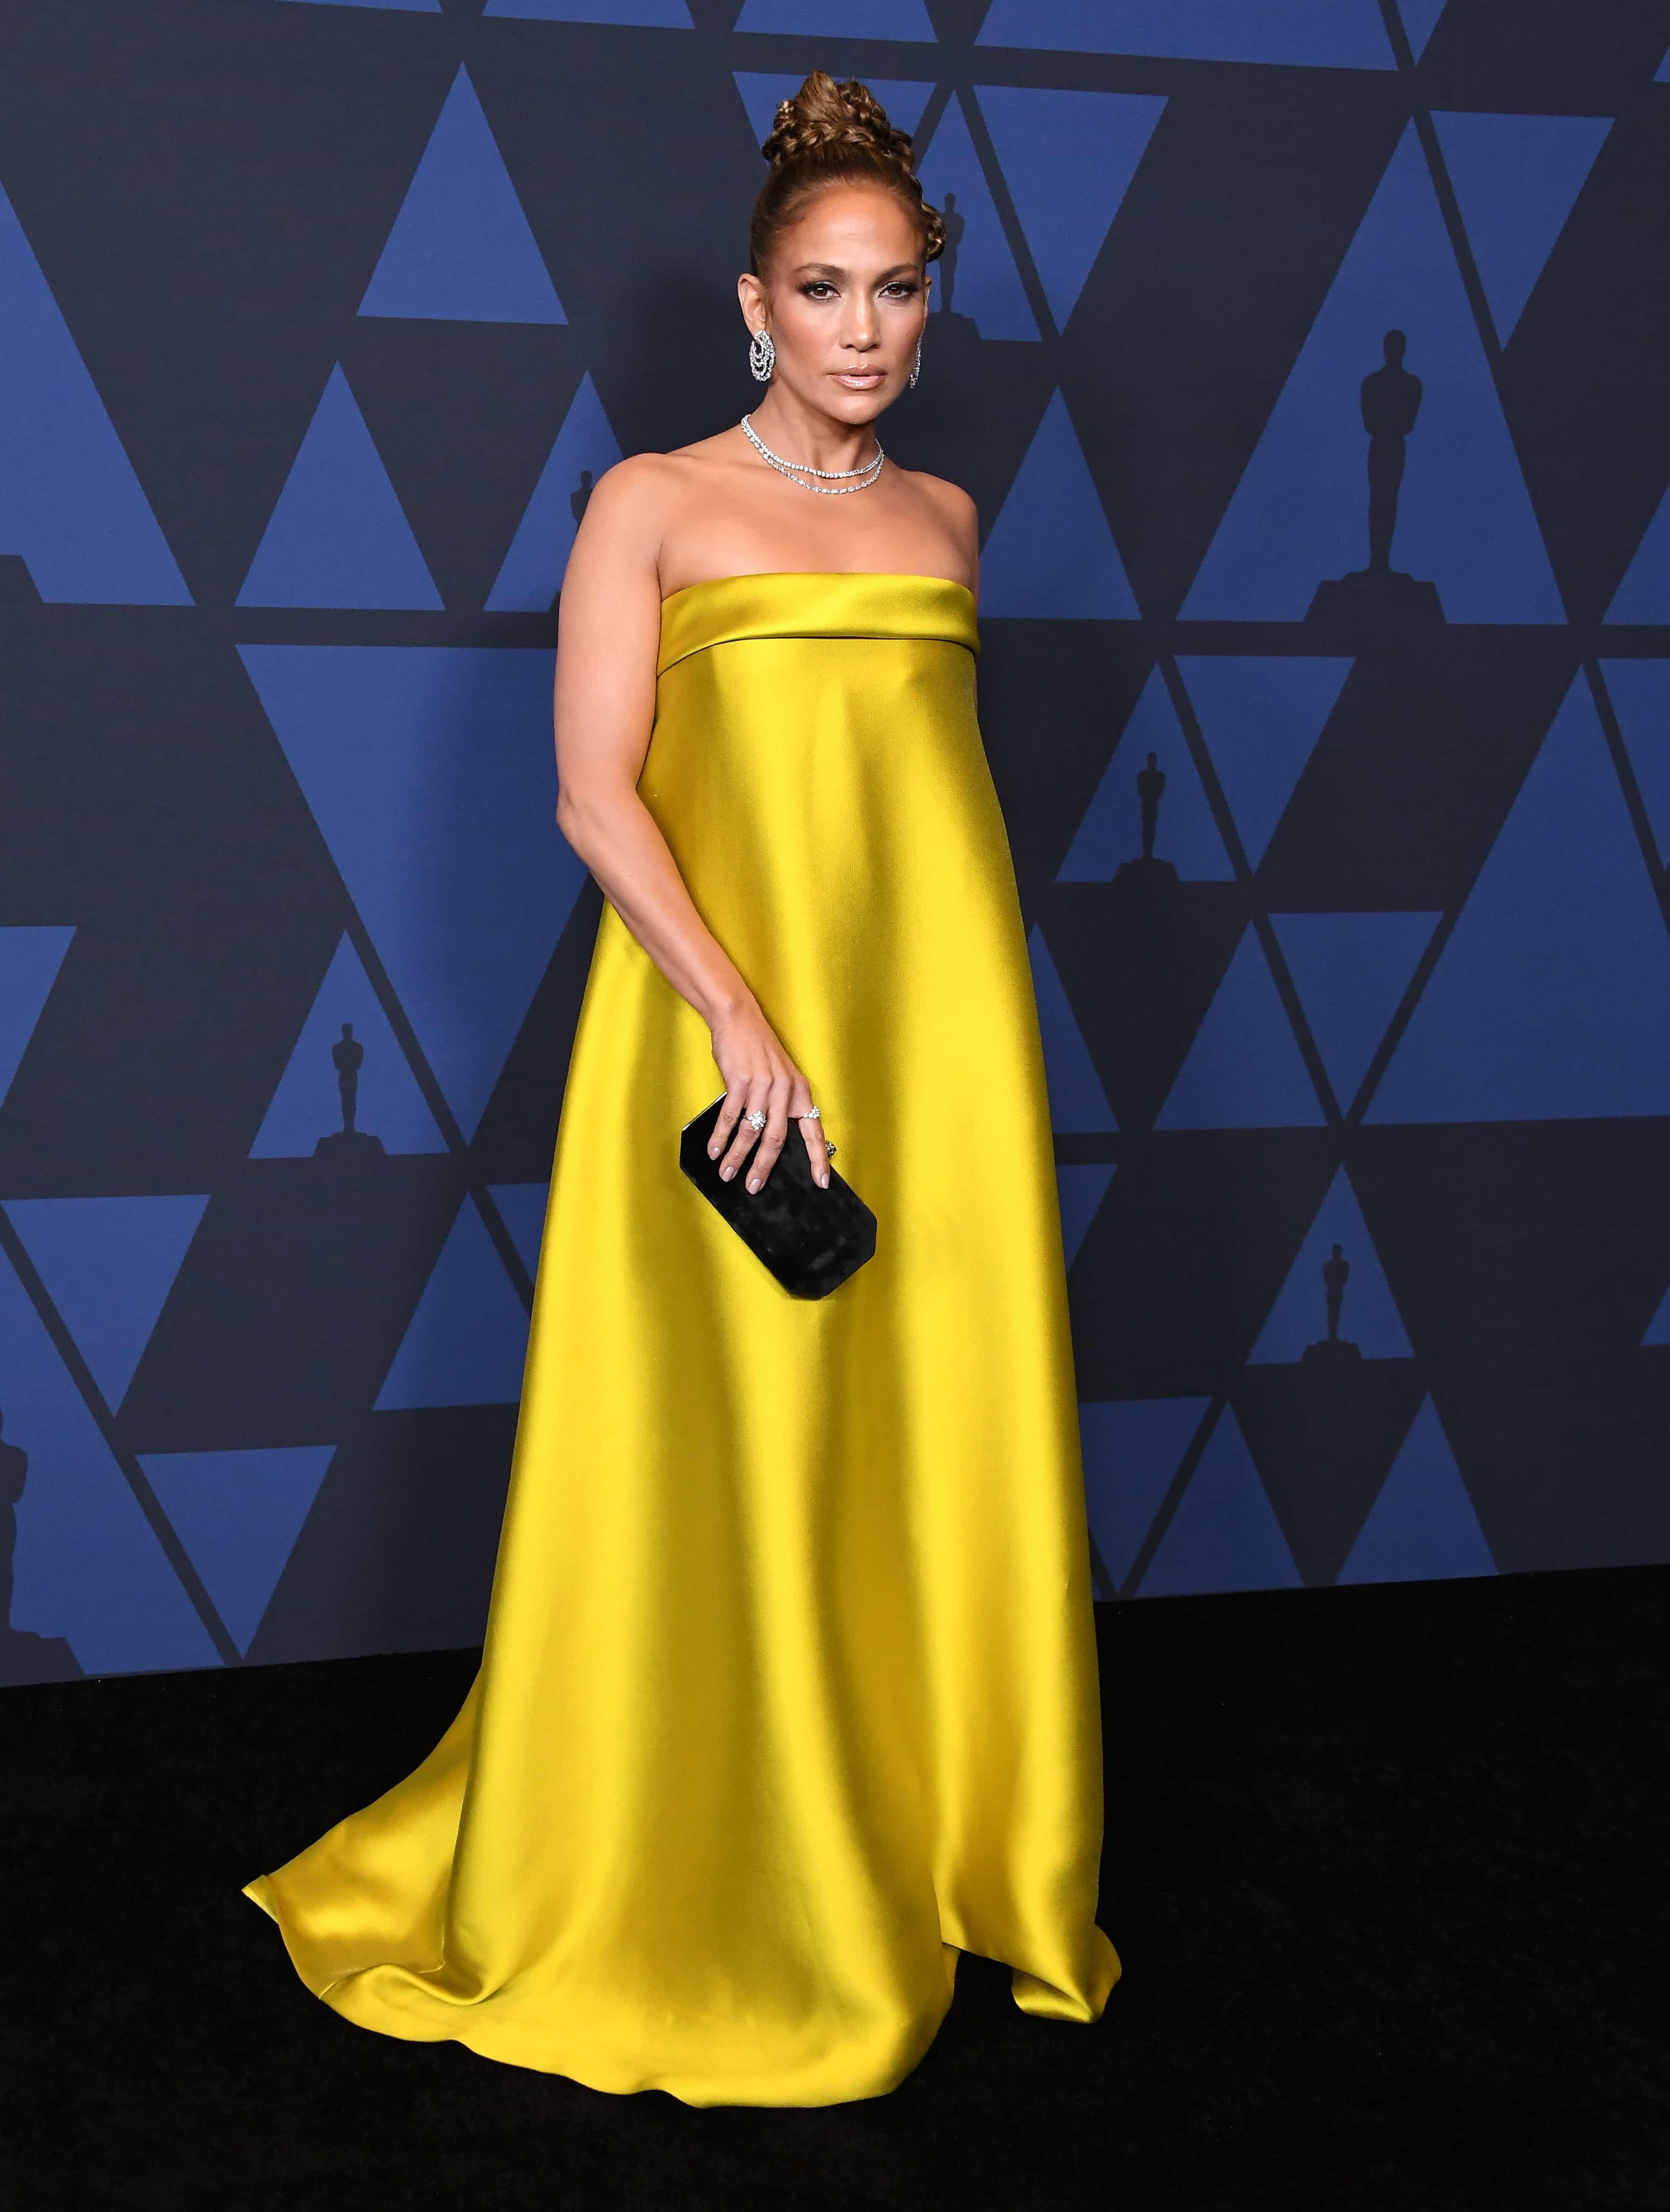 J-Lo Dazzles at the Awards' Red Carpet Wearing Diamonds Set in Precious Platinum